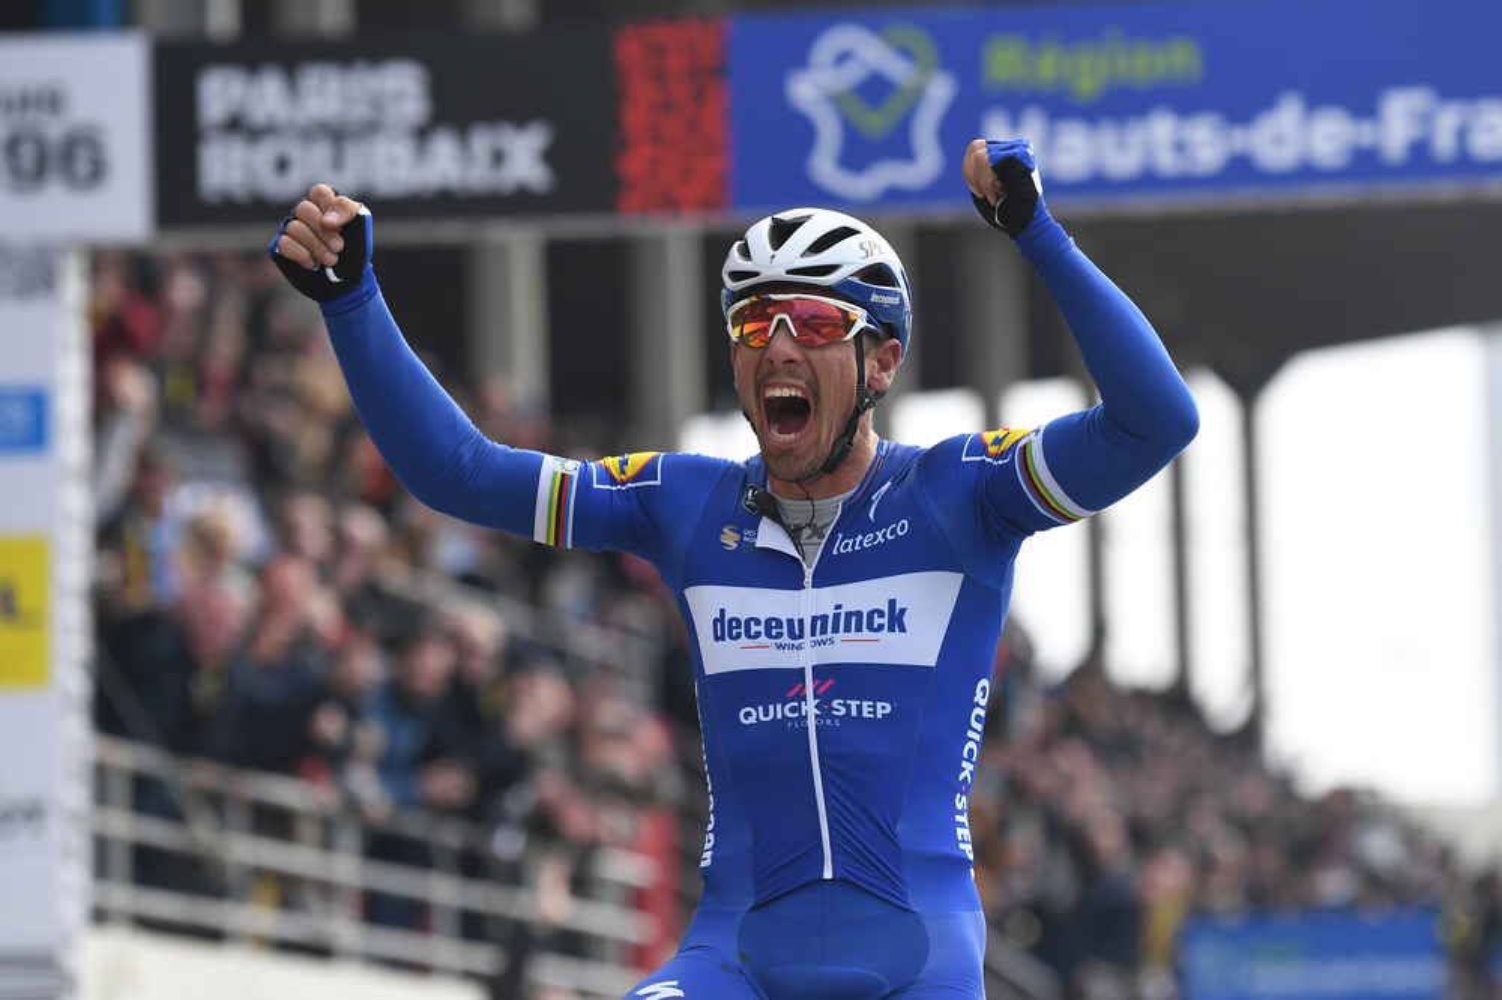 Clasificación Roubaix